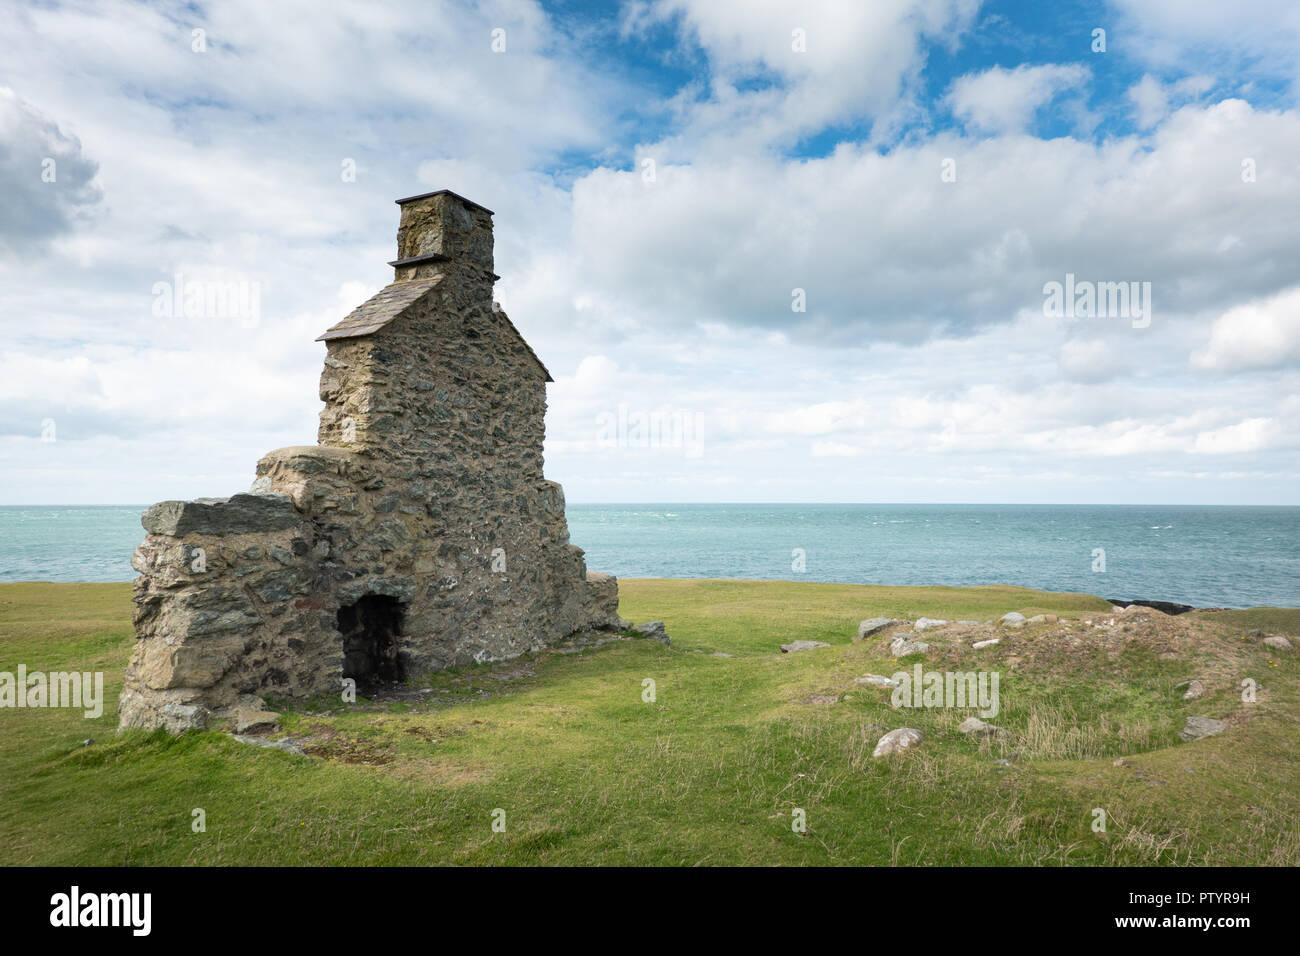 Cliff edge ruin at Porth Ysgaden on the Llŷn Peninsula. Stock Photo